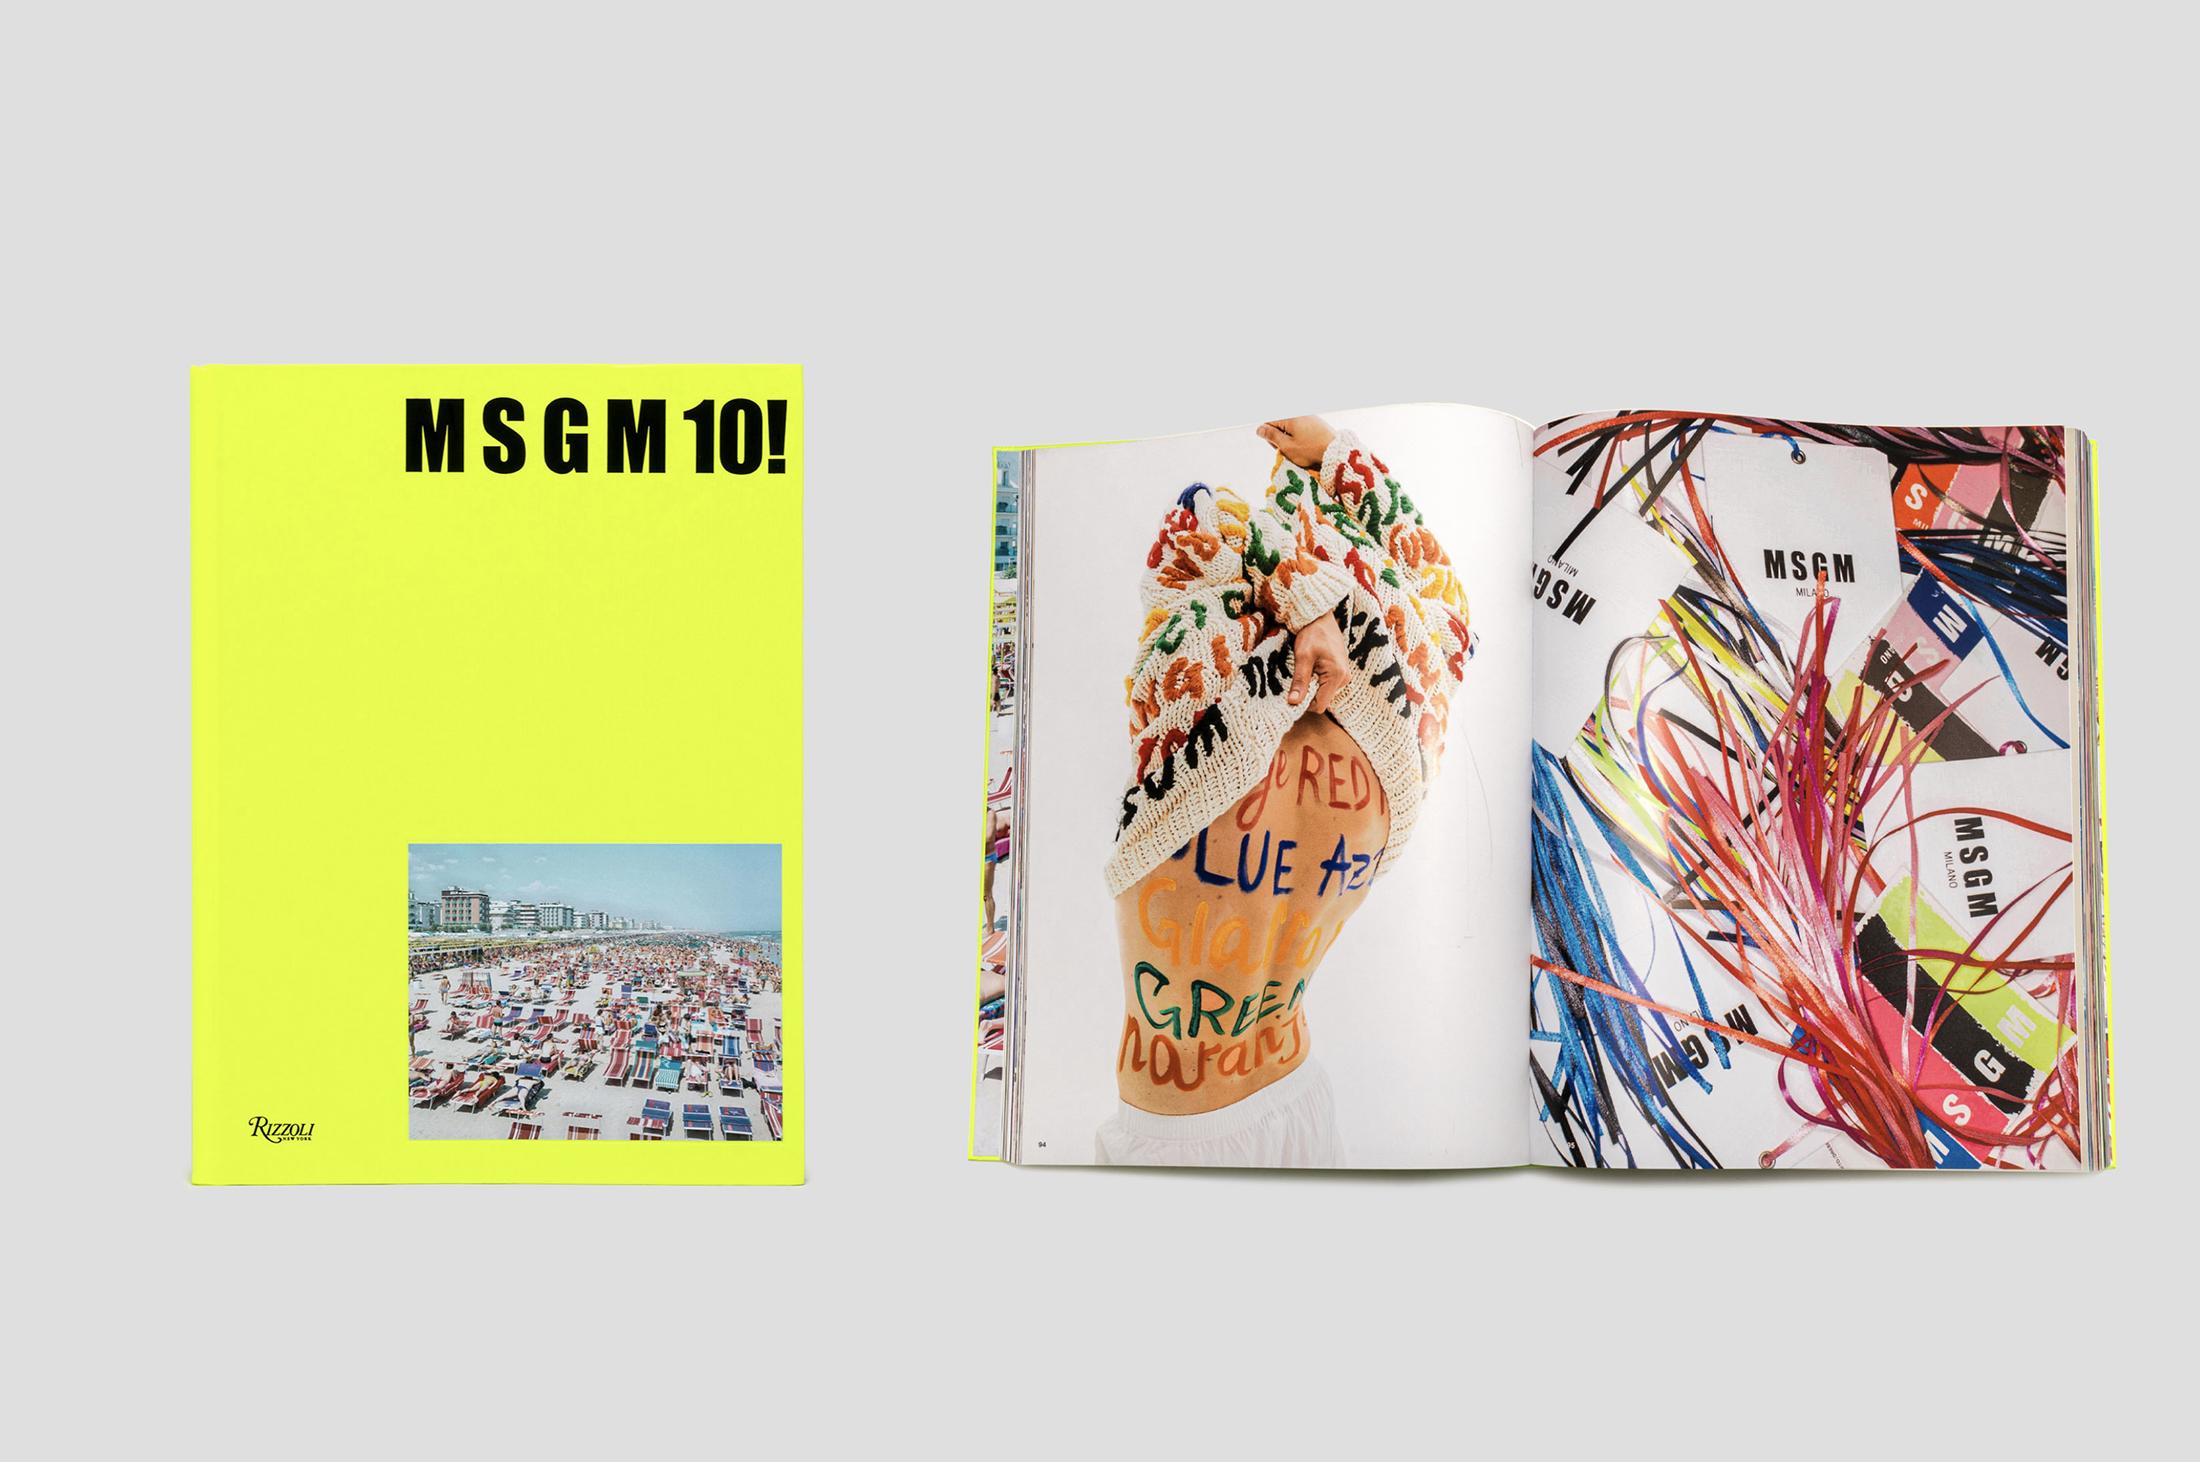 MSGM Releases 10th Anniversary Book